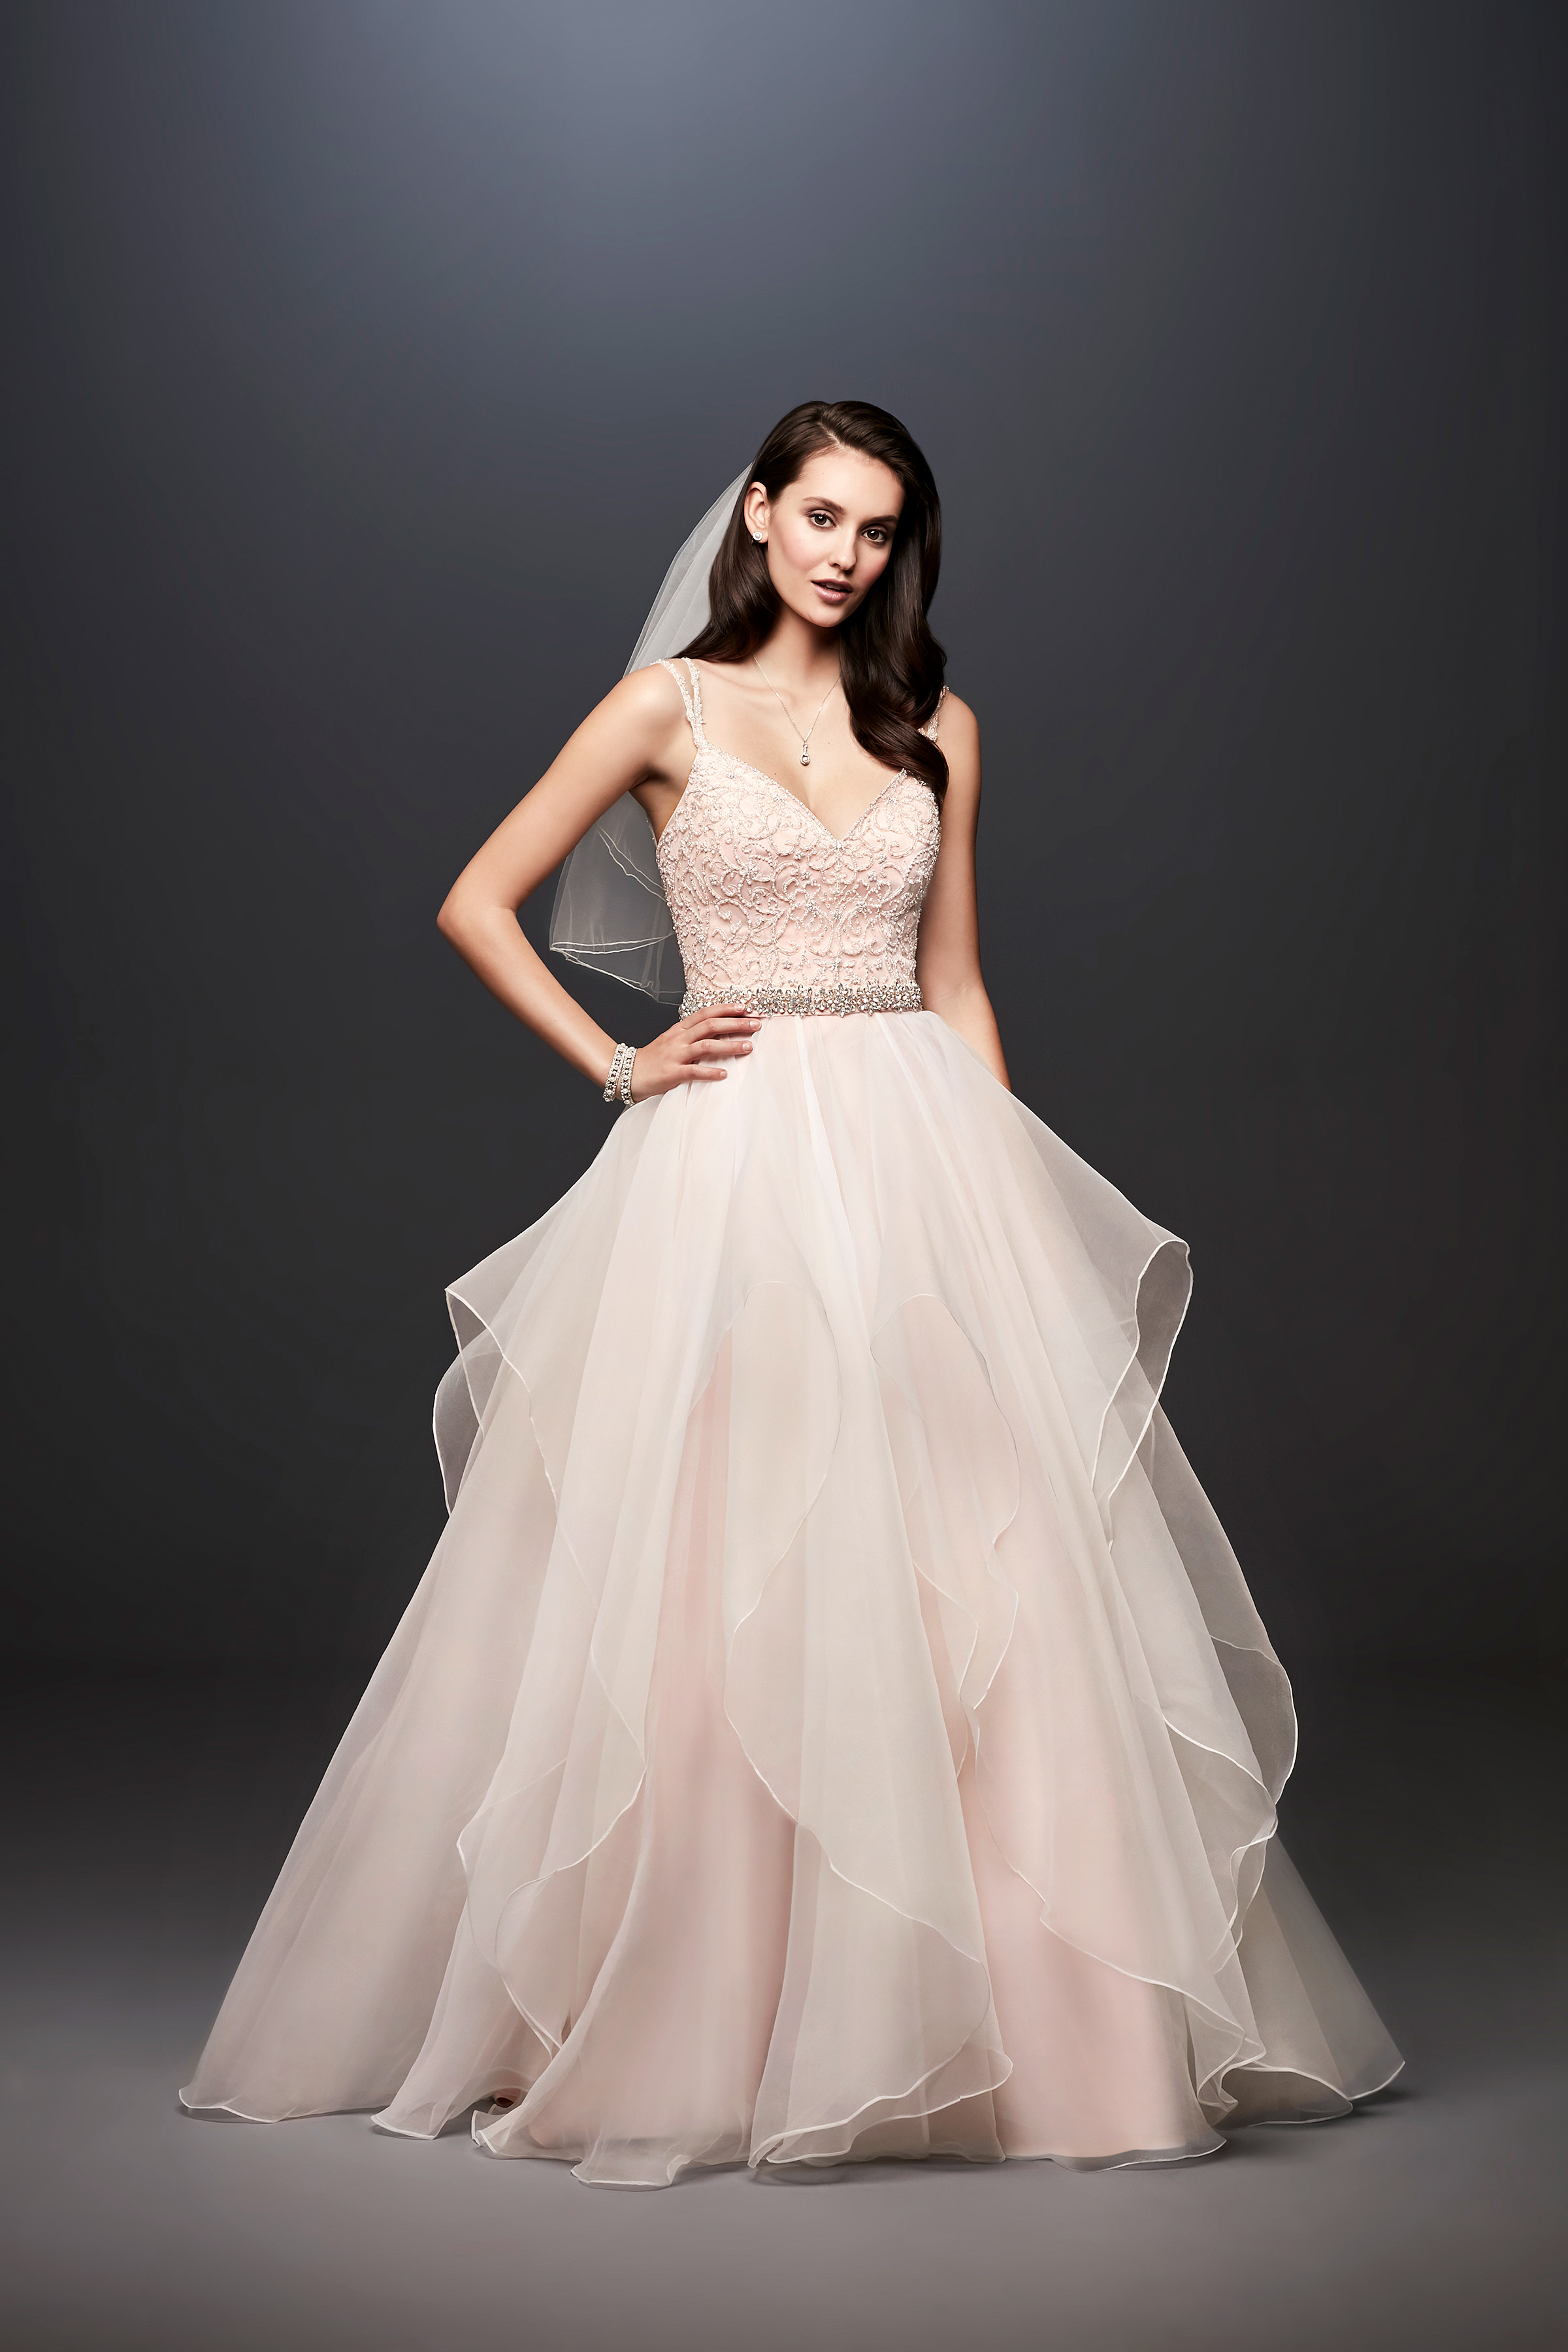 david bridal wedding dress spring 2019 cap sleeves illusion neckline tired